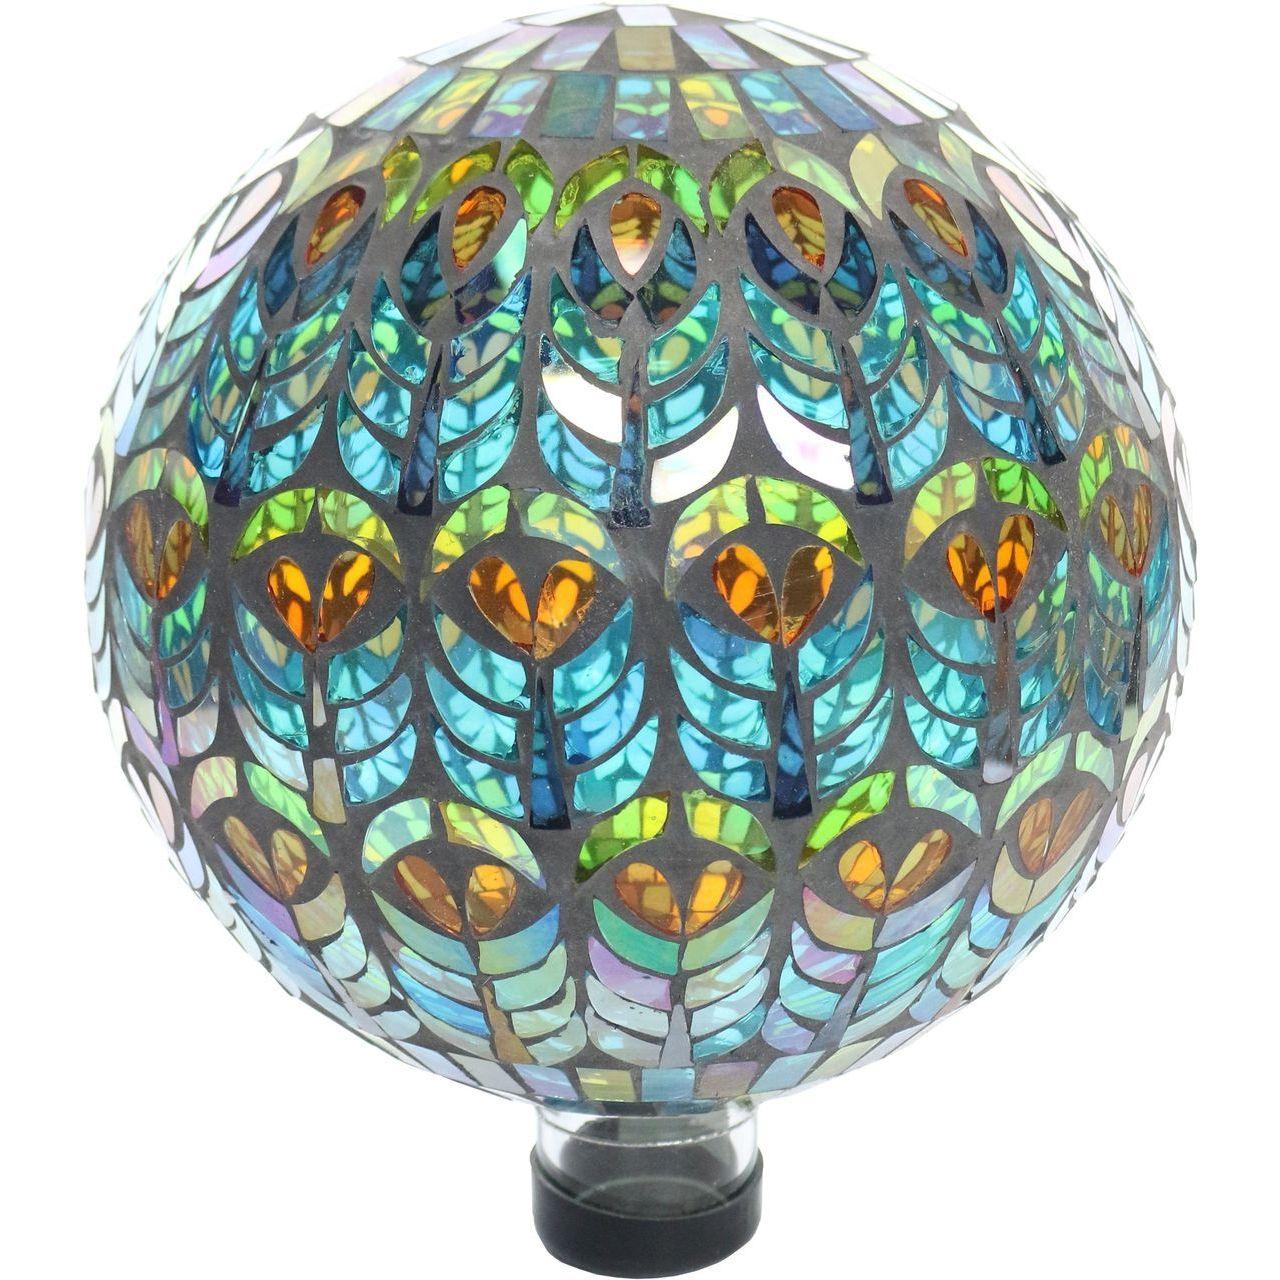 Alpine GRS926 10'' Mesmerizing Peacock Feather Pattern Mosaic Gazing Globe